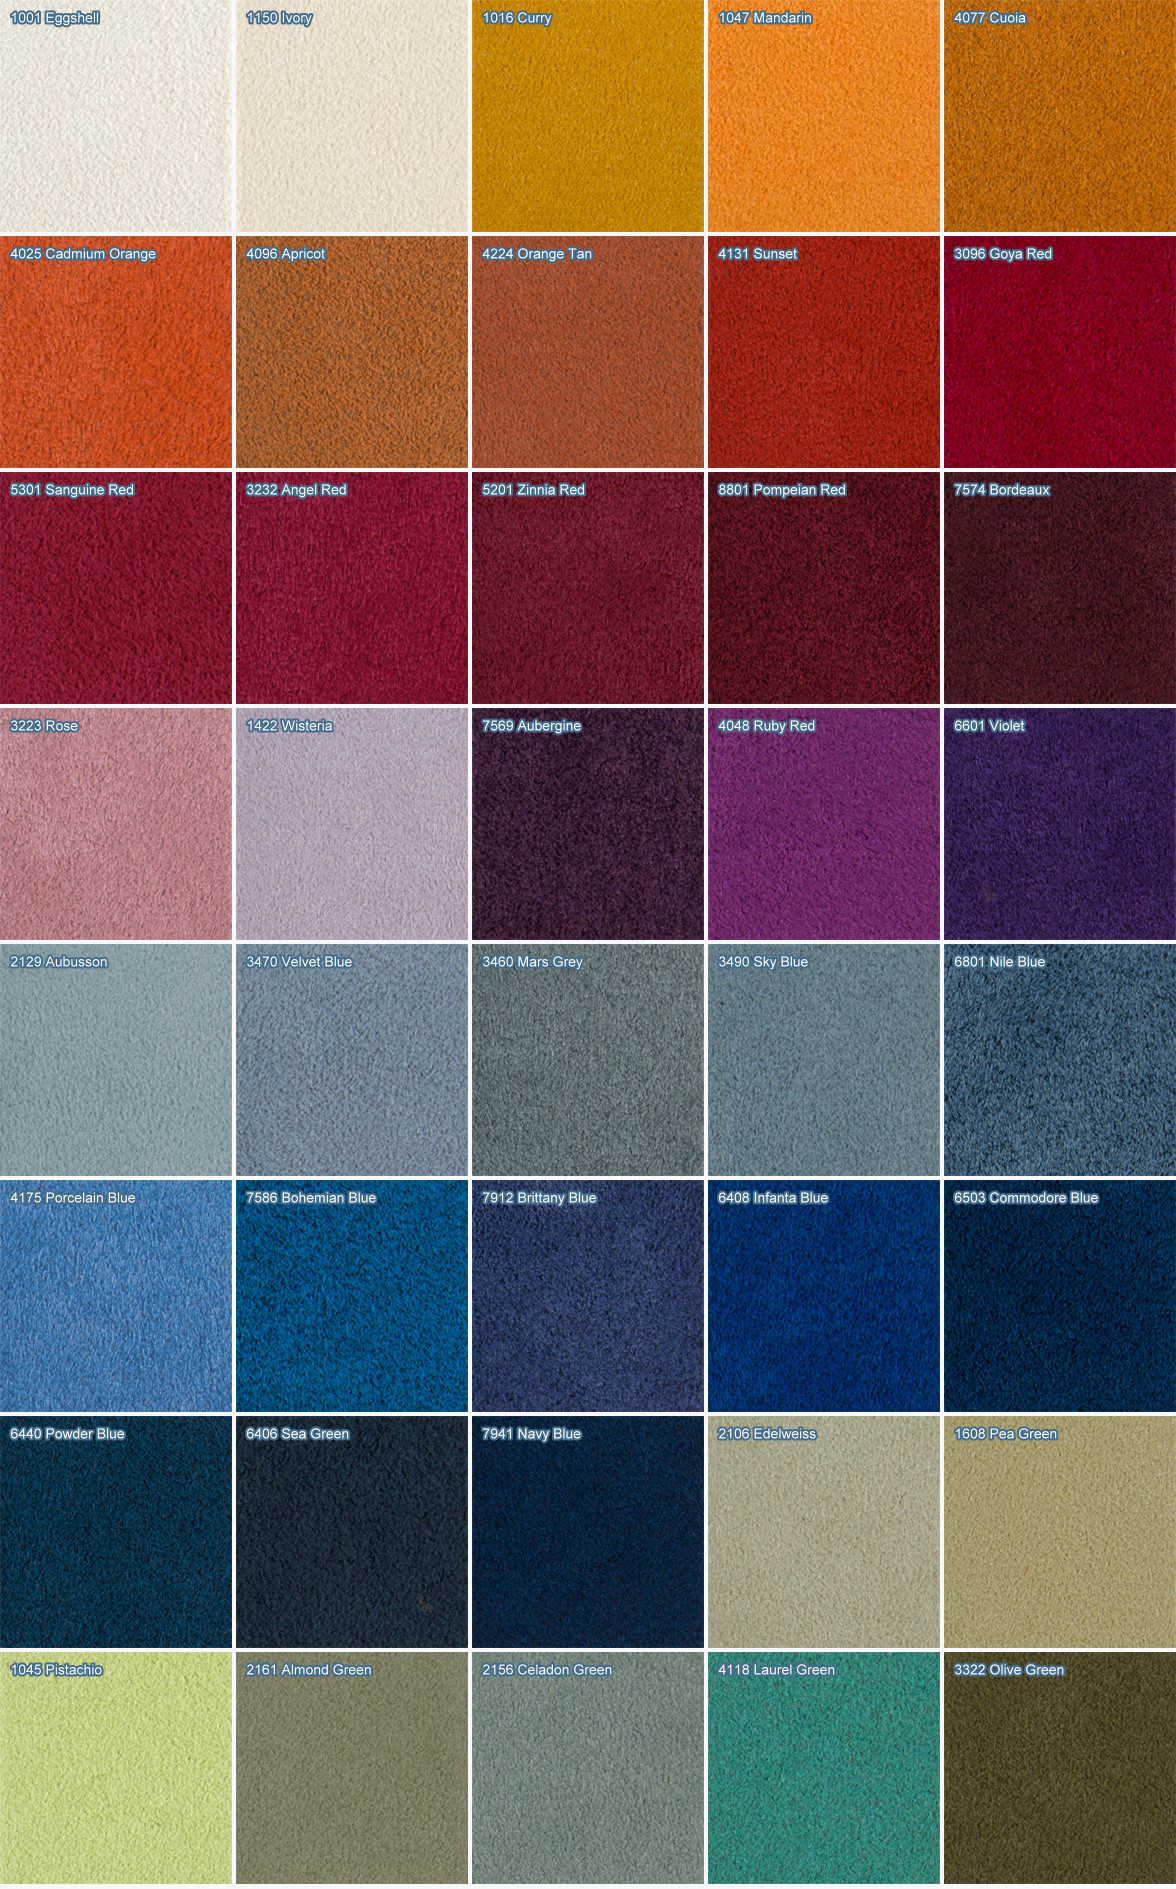 Tessuto alcantara sanotint light tabella colori - Tingere tessuti divano ...